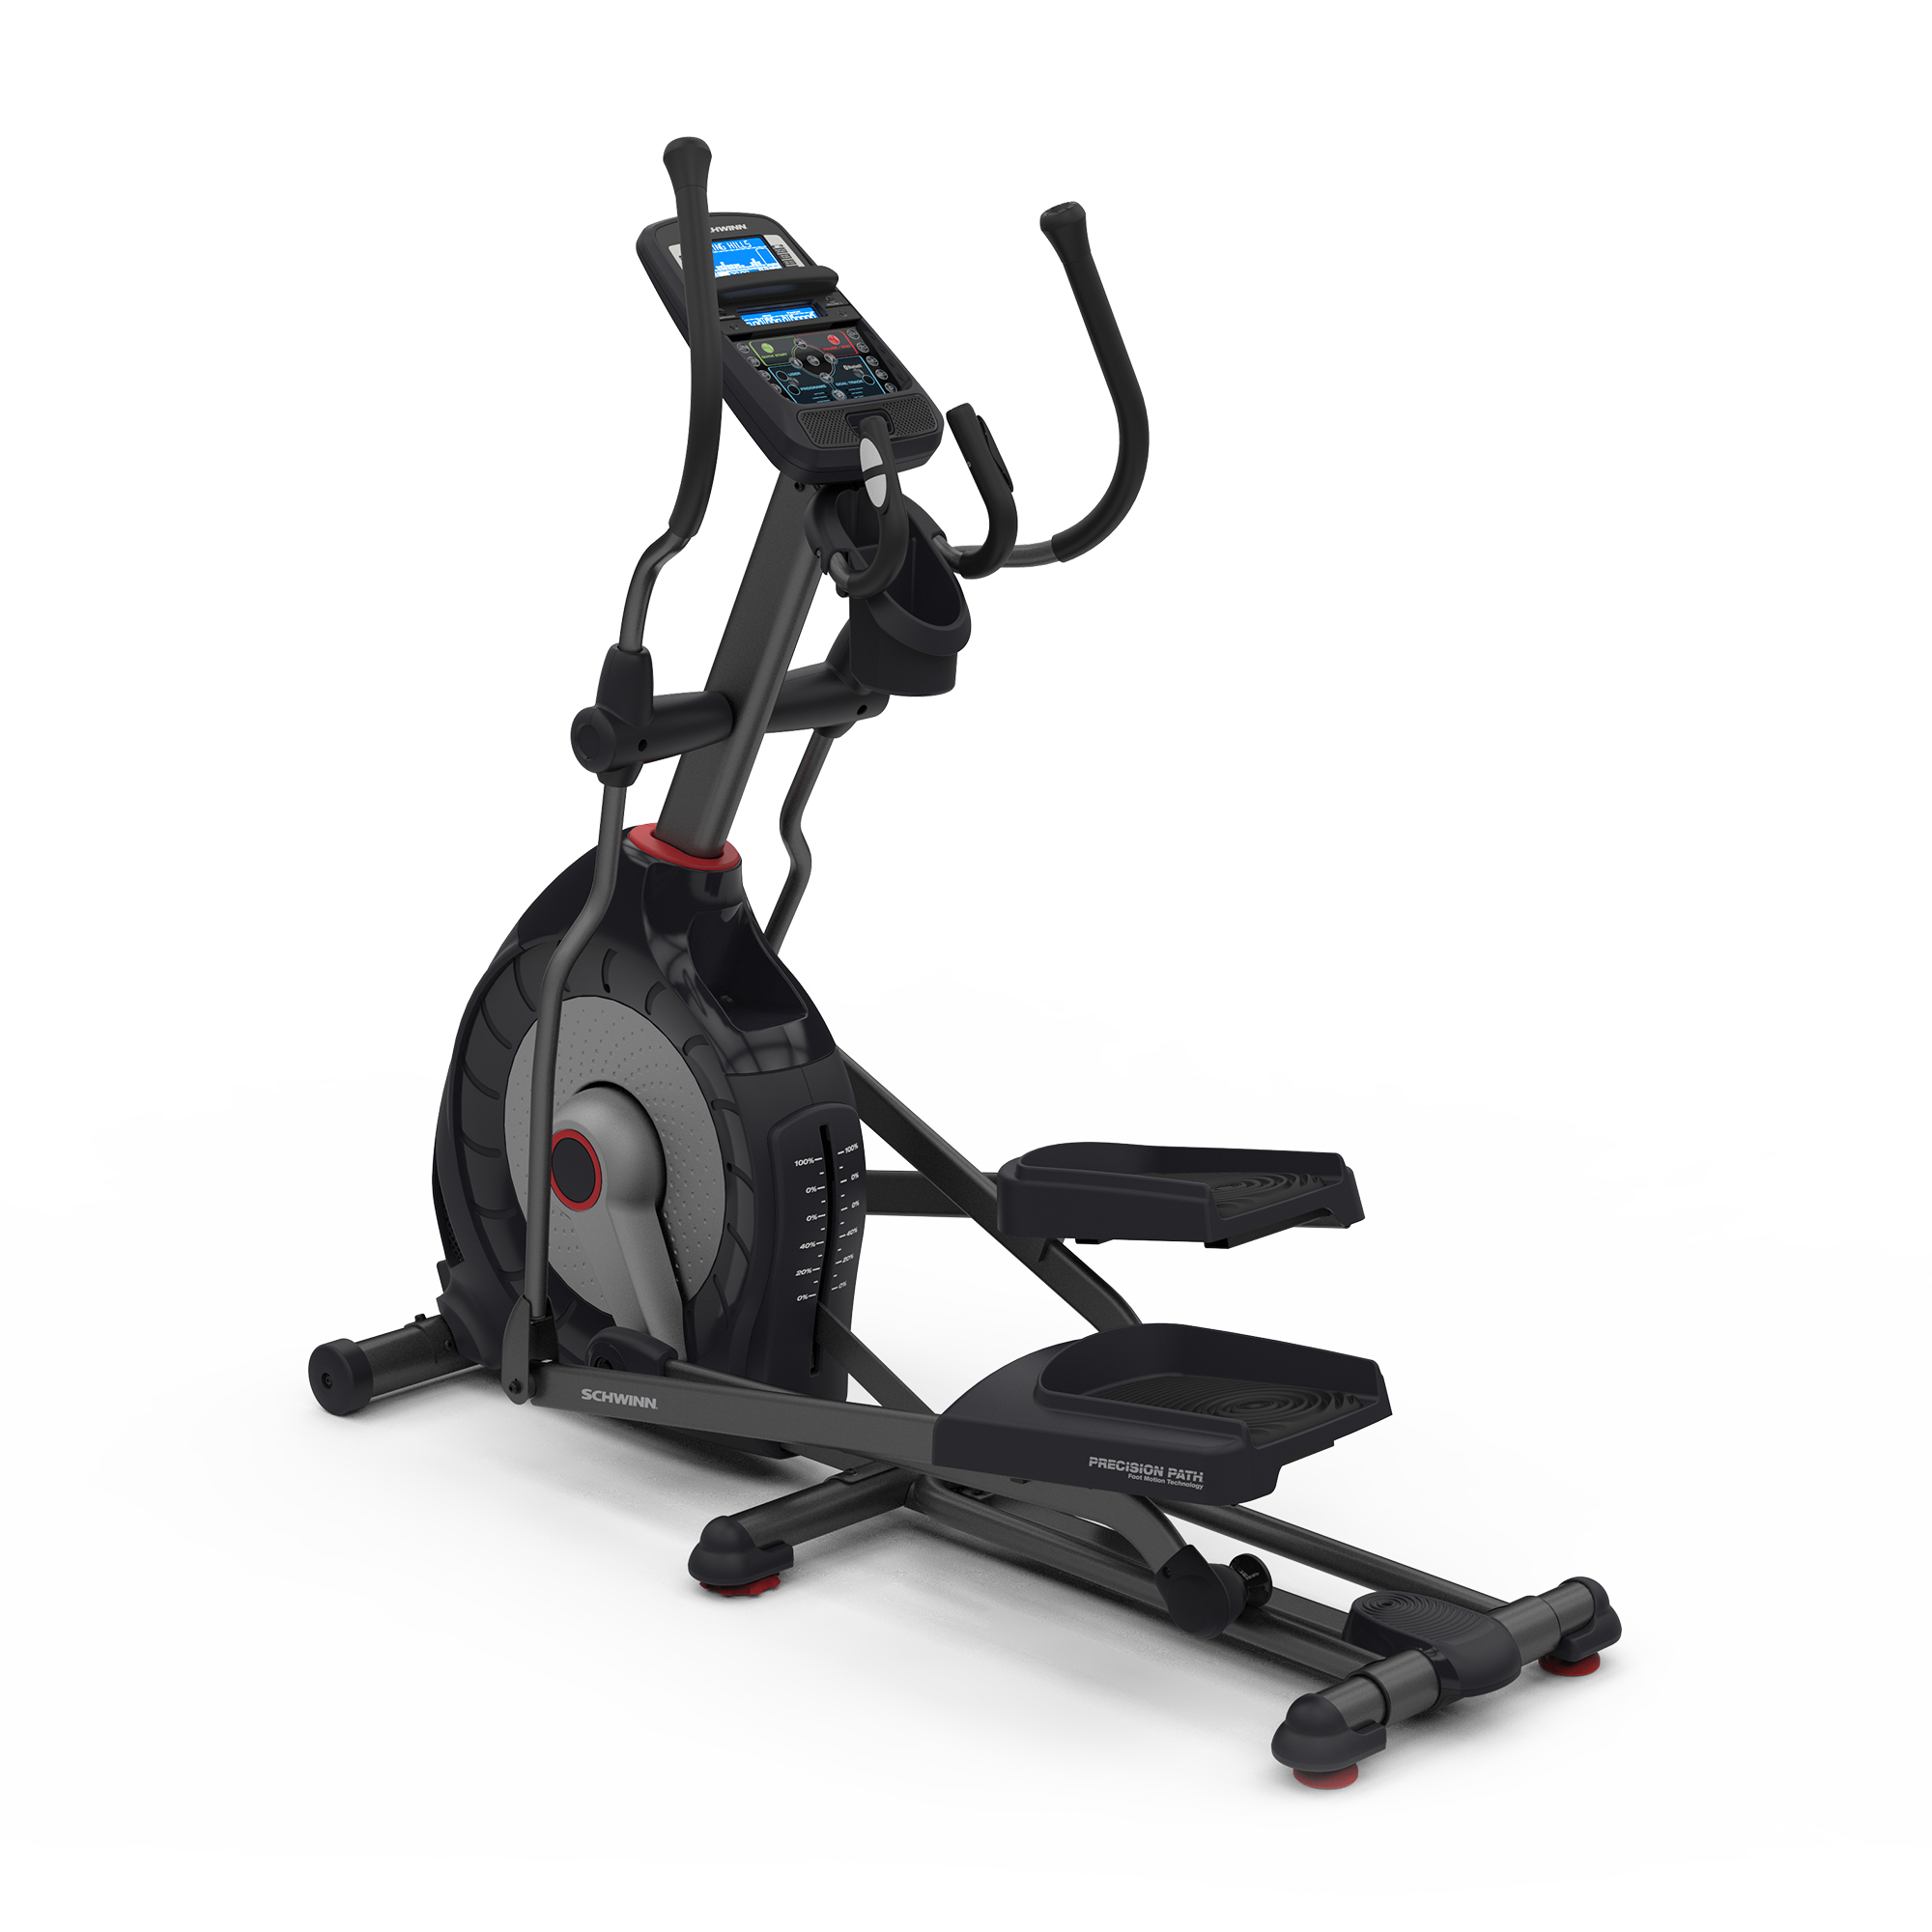 Elliptical Bike Or Treadmill: Schwinn 470 Elliptical